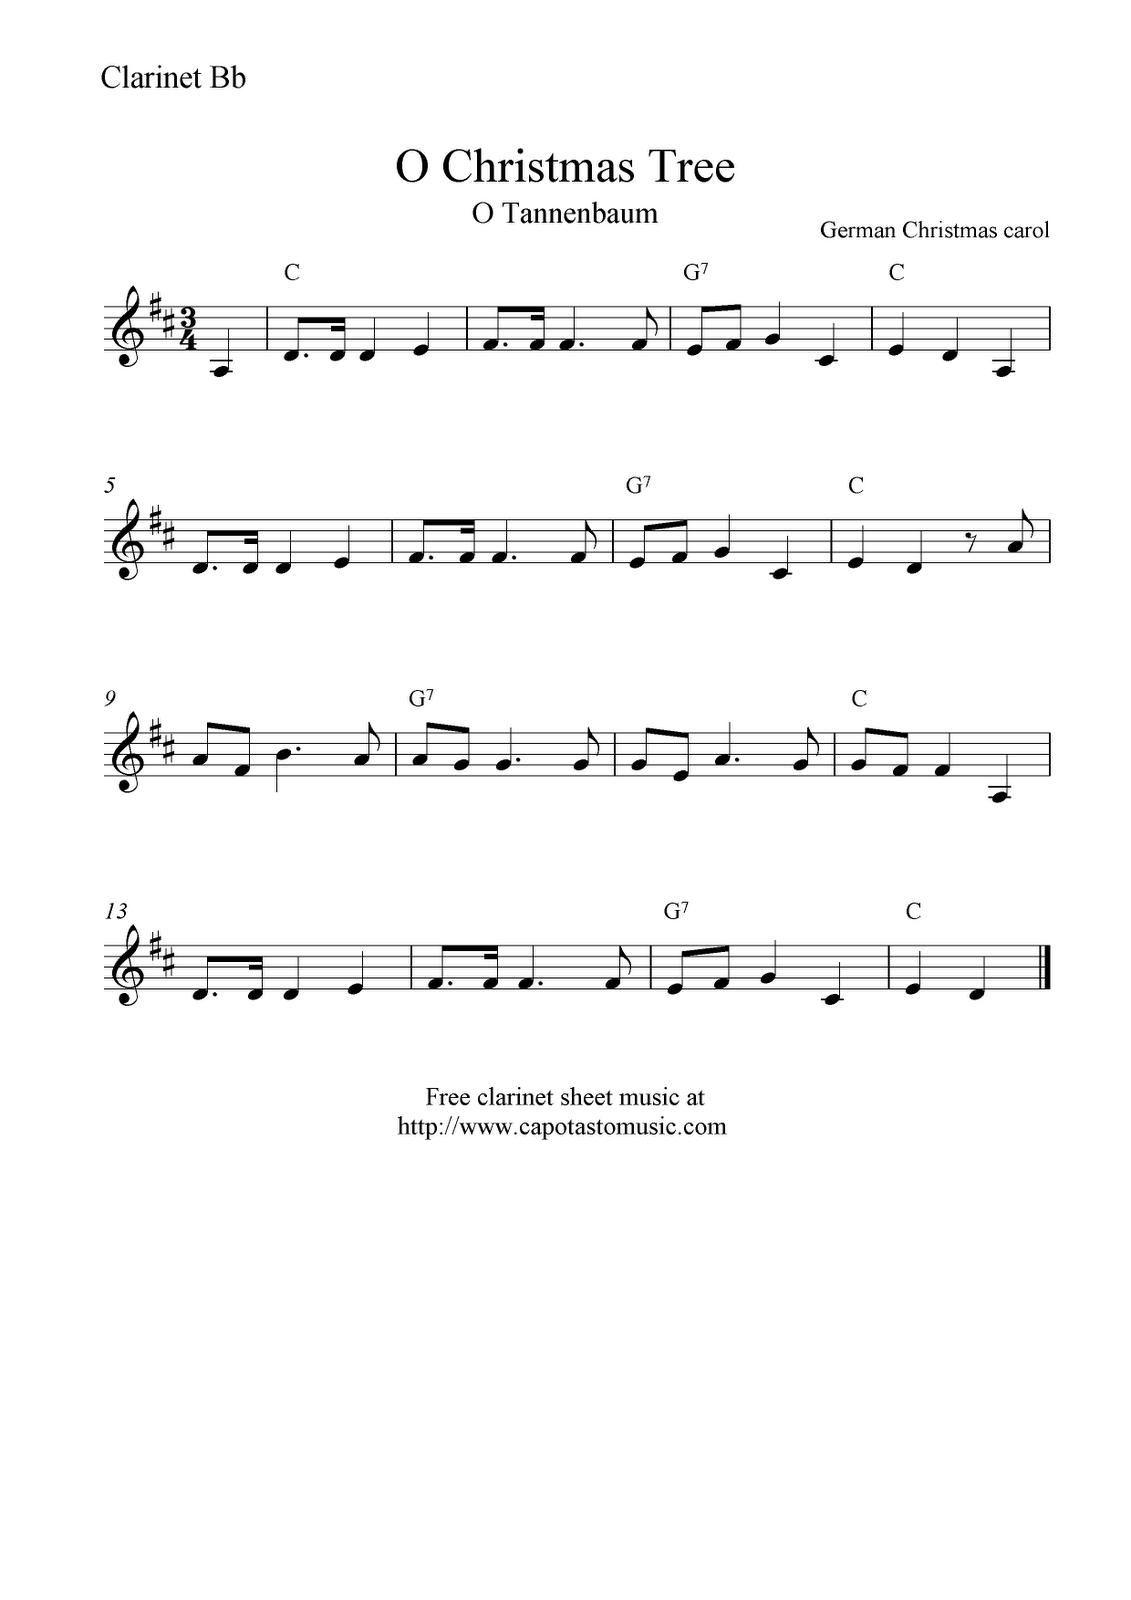 Free Sheet Music Scores: O Christmas Tree (O Tannenbaum), Free - Free Printable Christmas Sheet Music For Clarinet